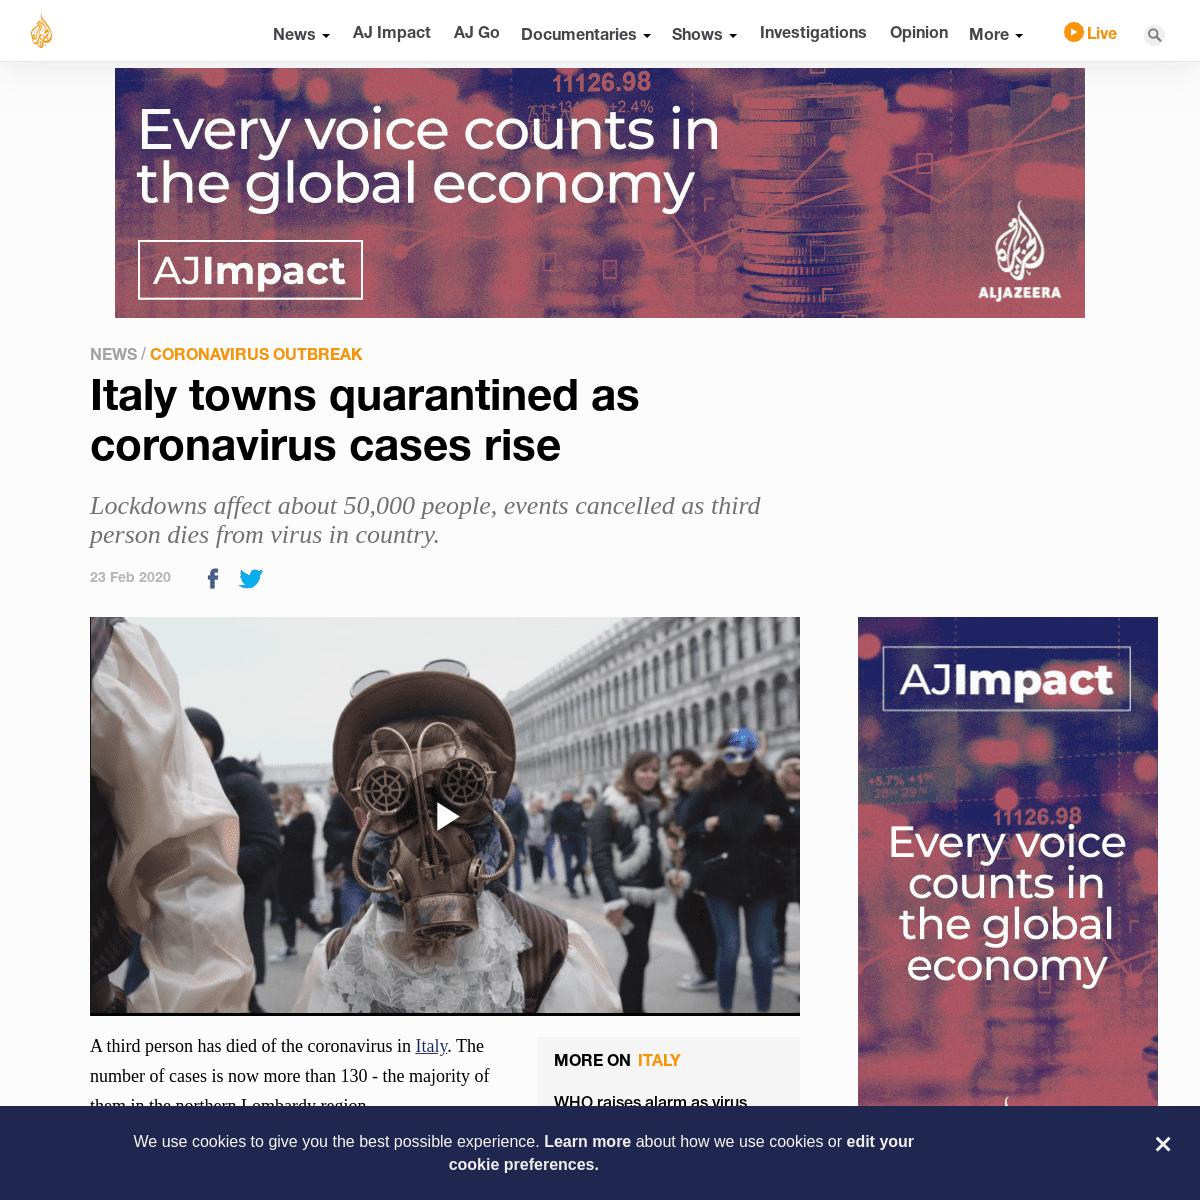 Italy towns quarantined as coronavirus cases rise - Coronavirus outbreak News - Al Jazeera